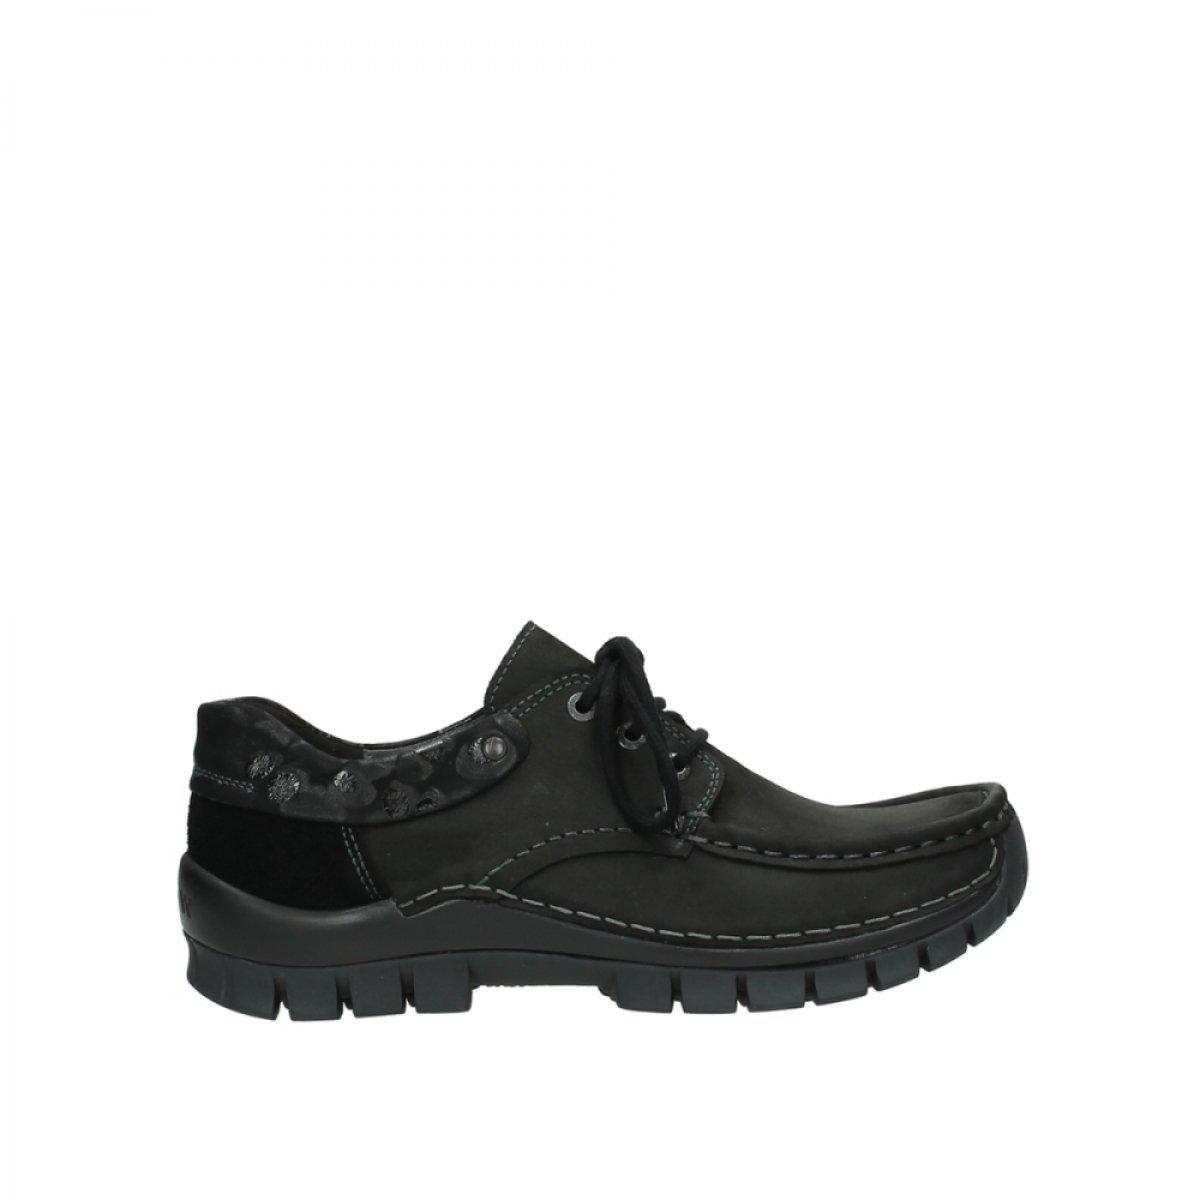 Wolky Womens Rio Leather Sandals 37 EU|59000 Schwarz Leder